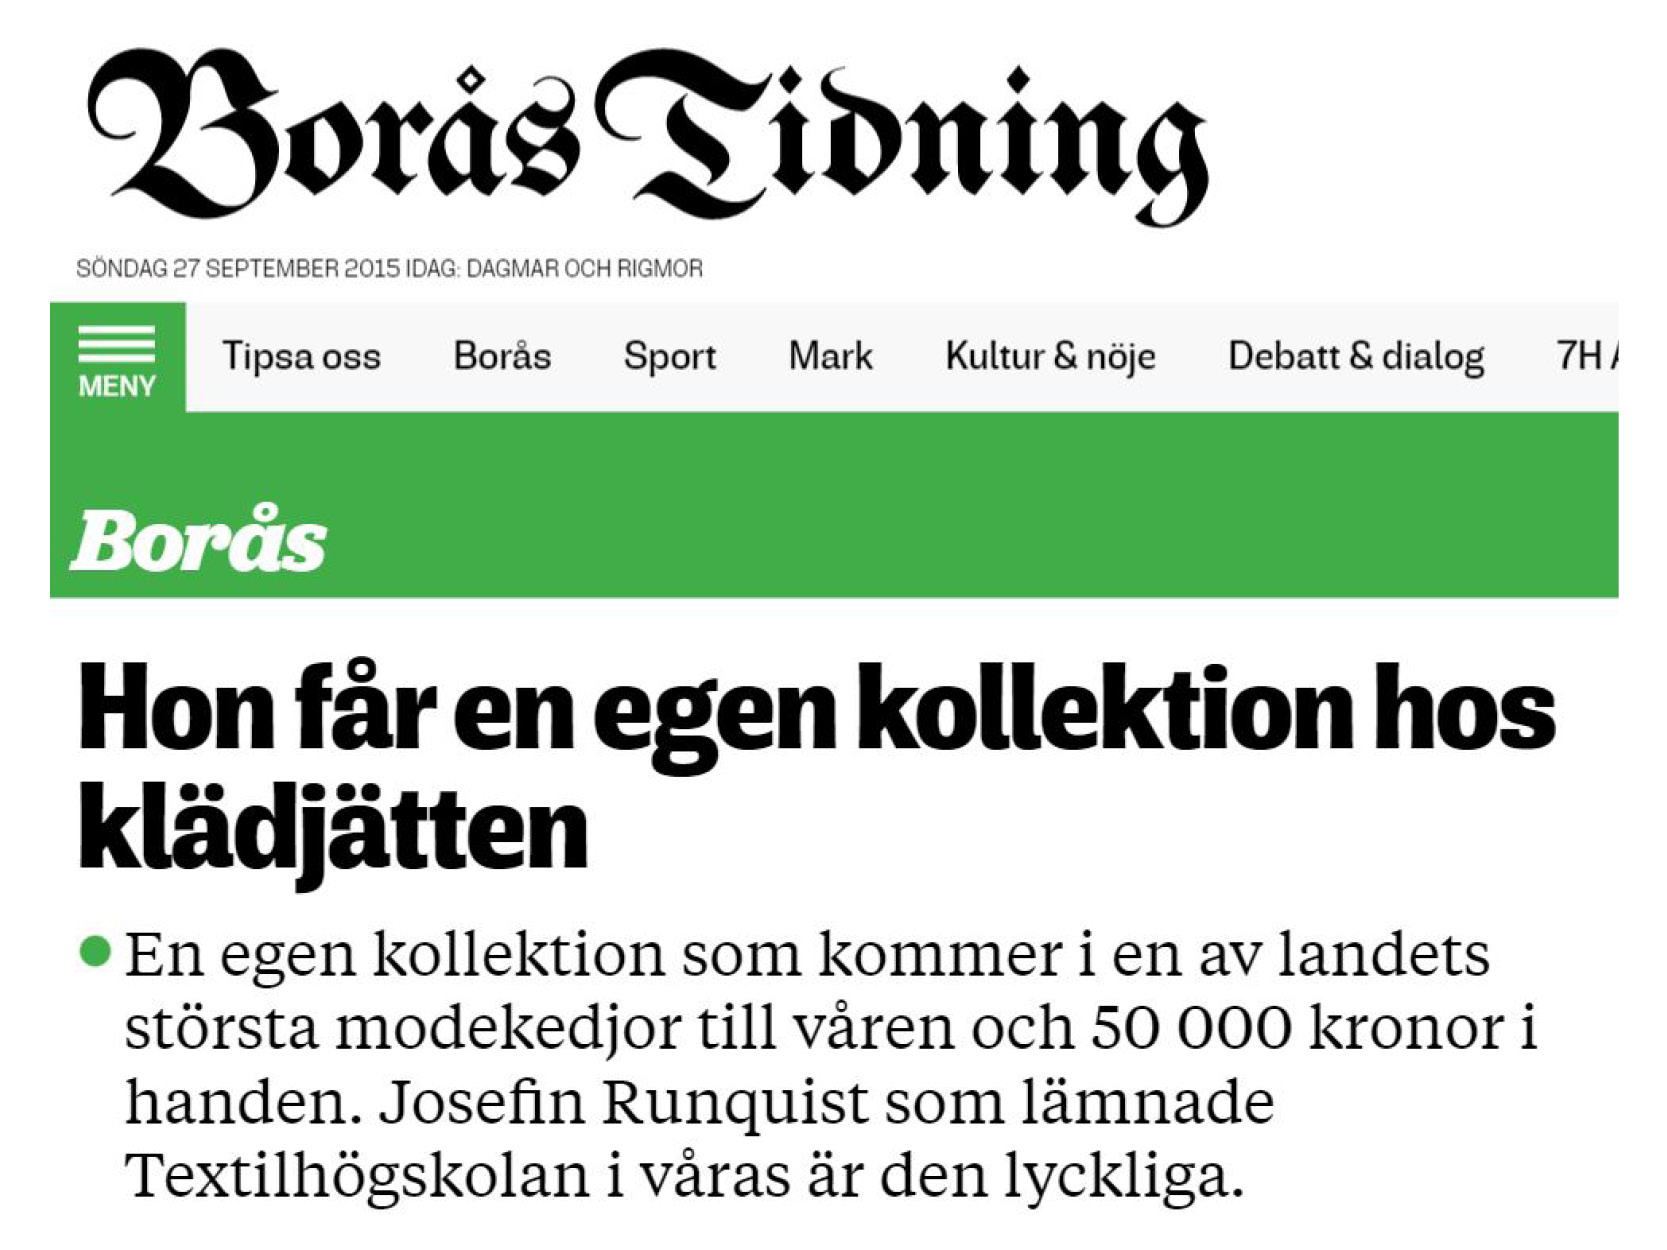 josefin runquist4